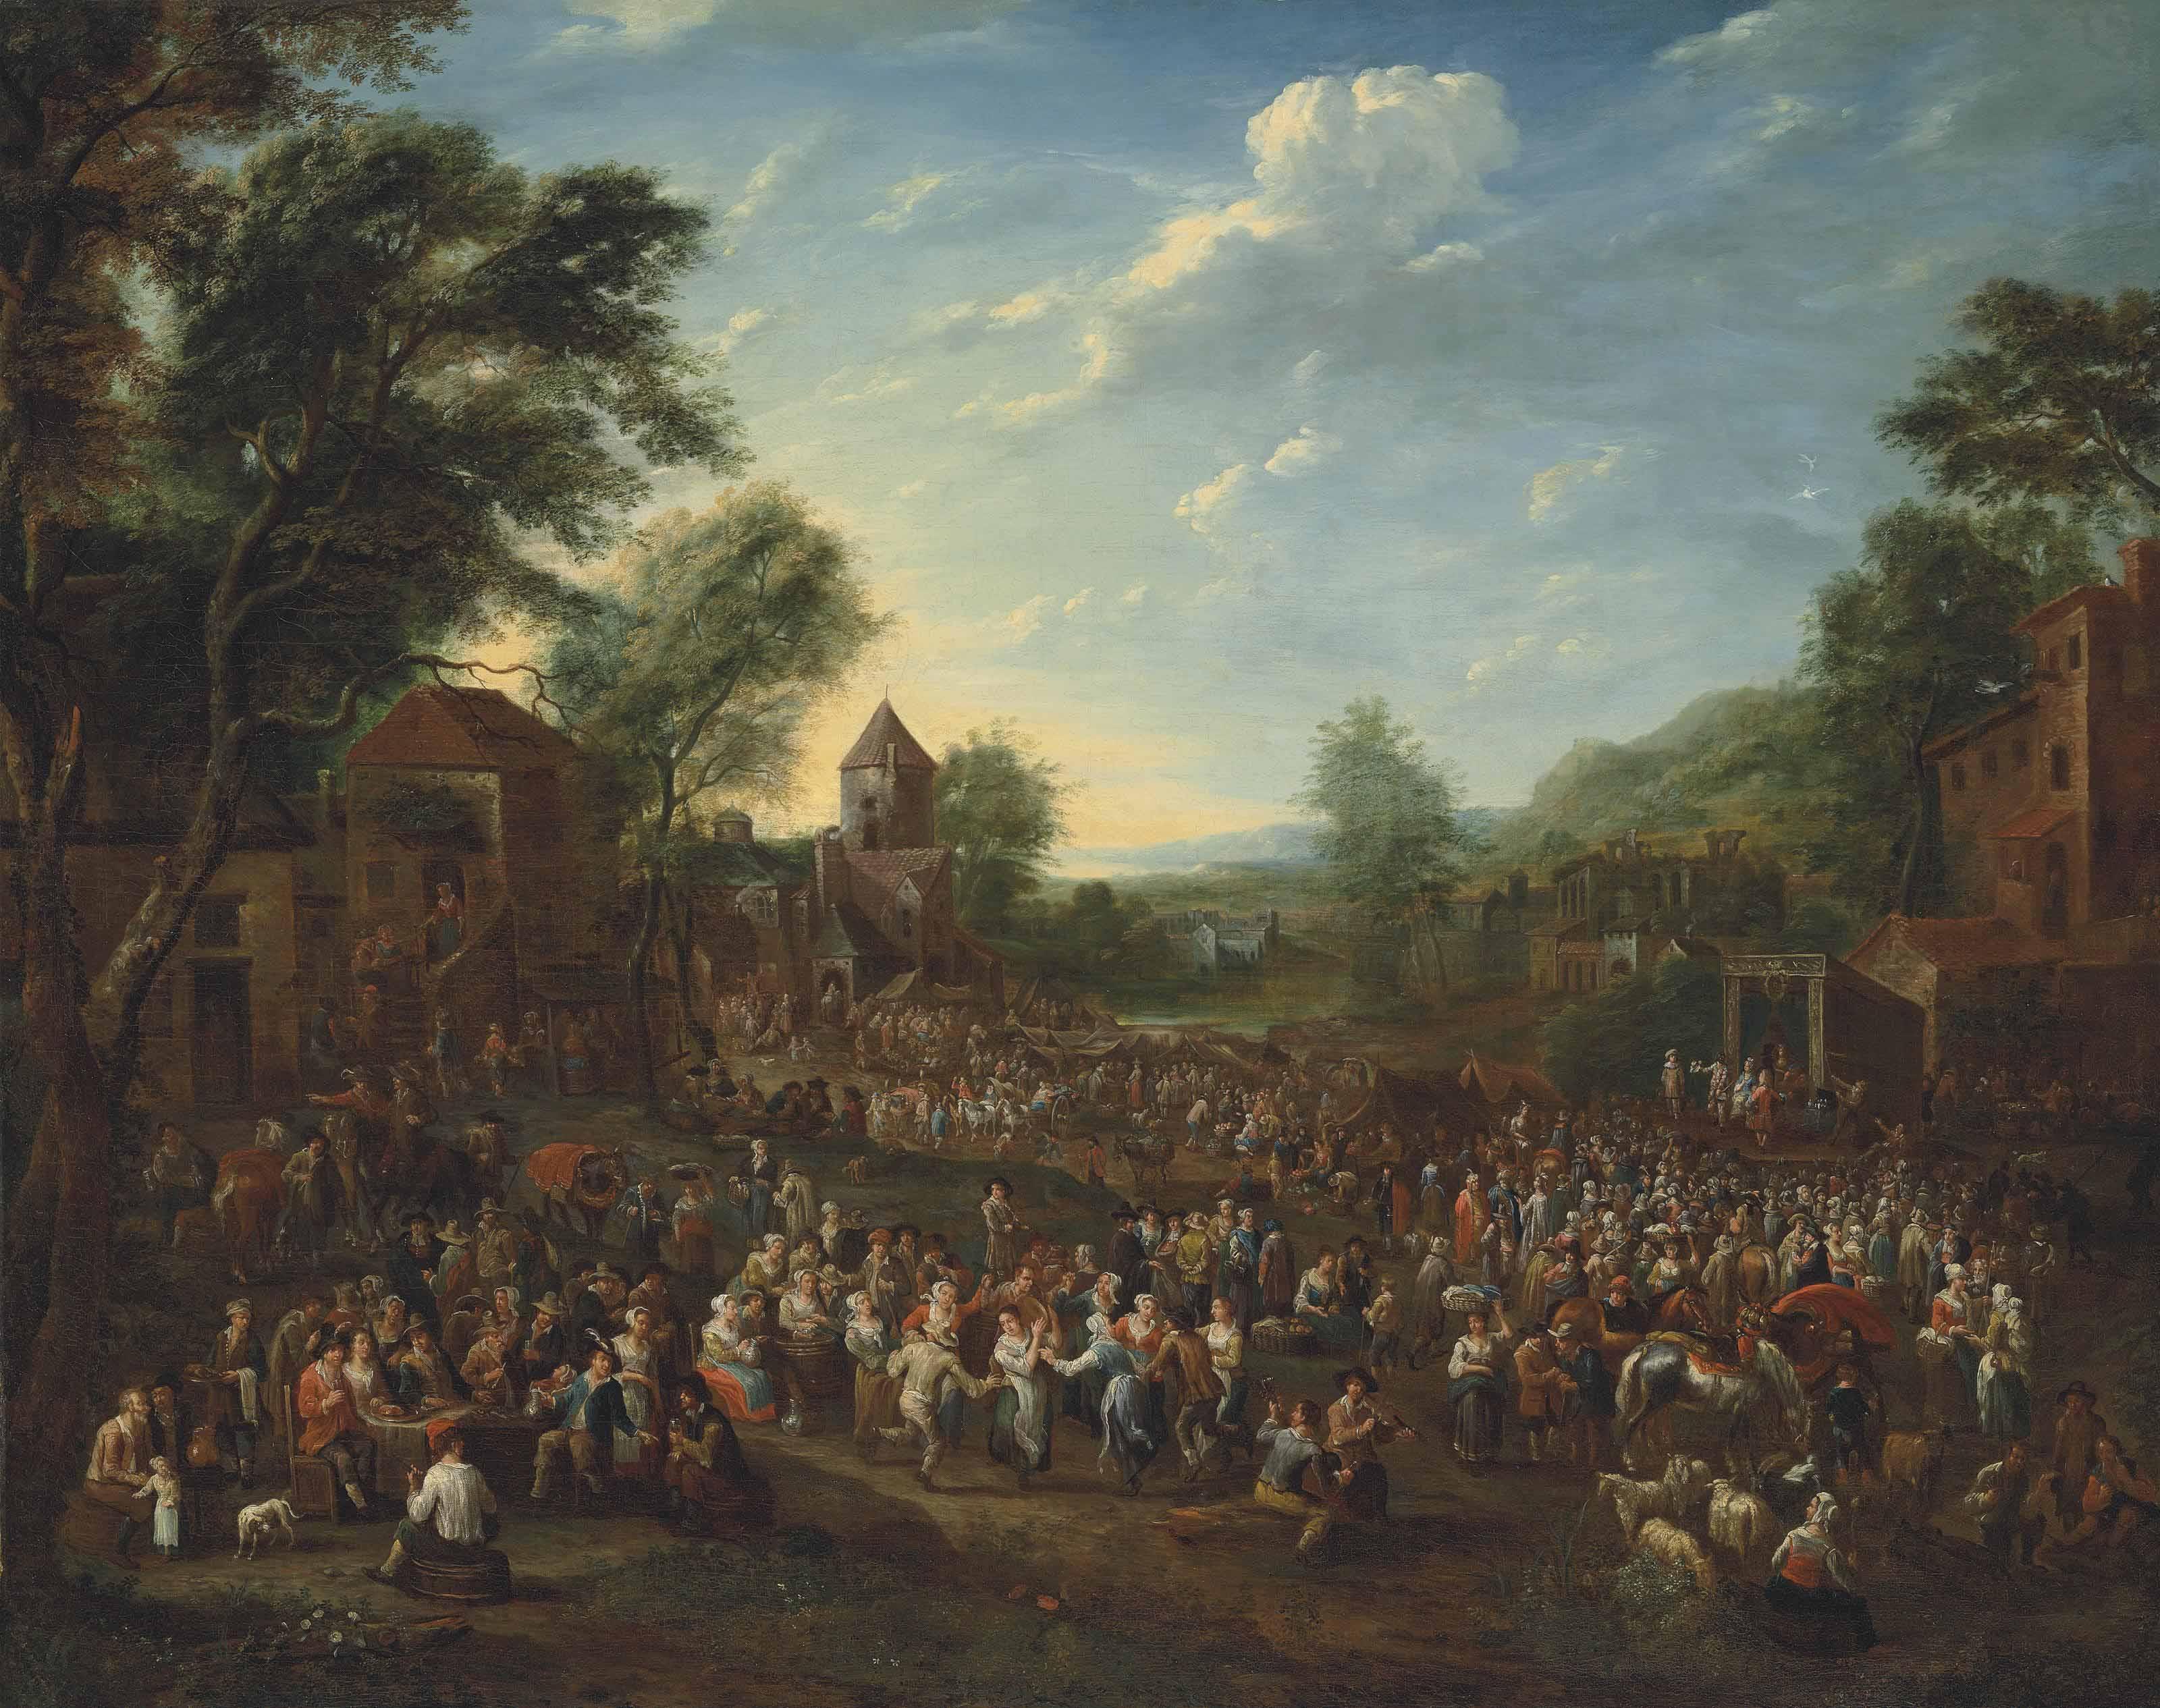 Elisabeth Seldron (active c. 1702-1761)